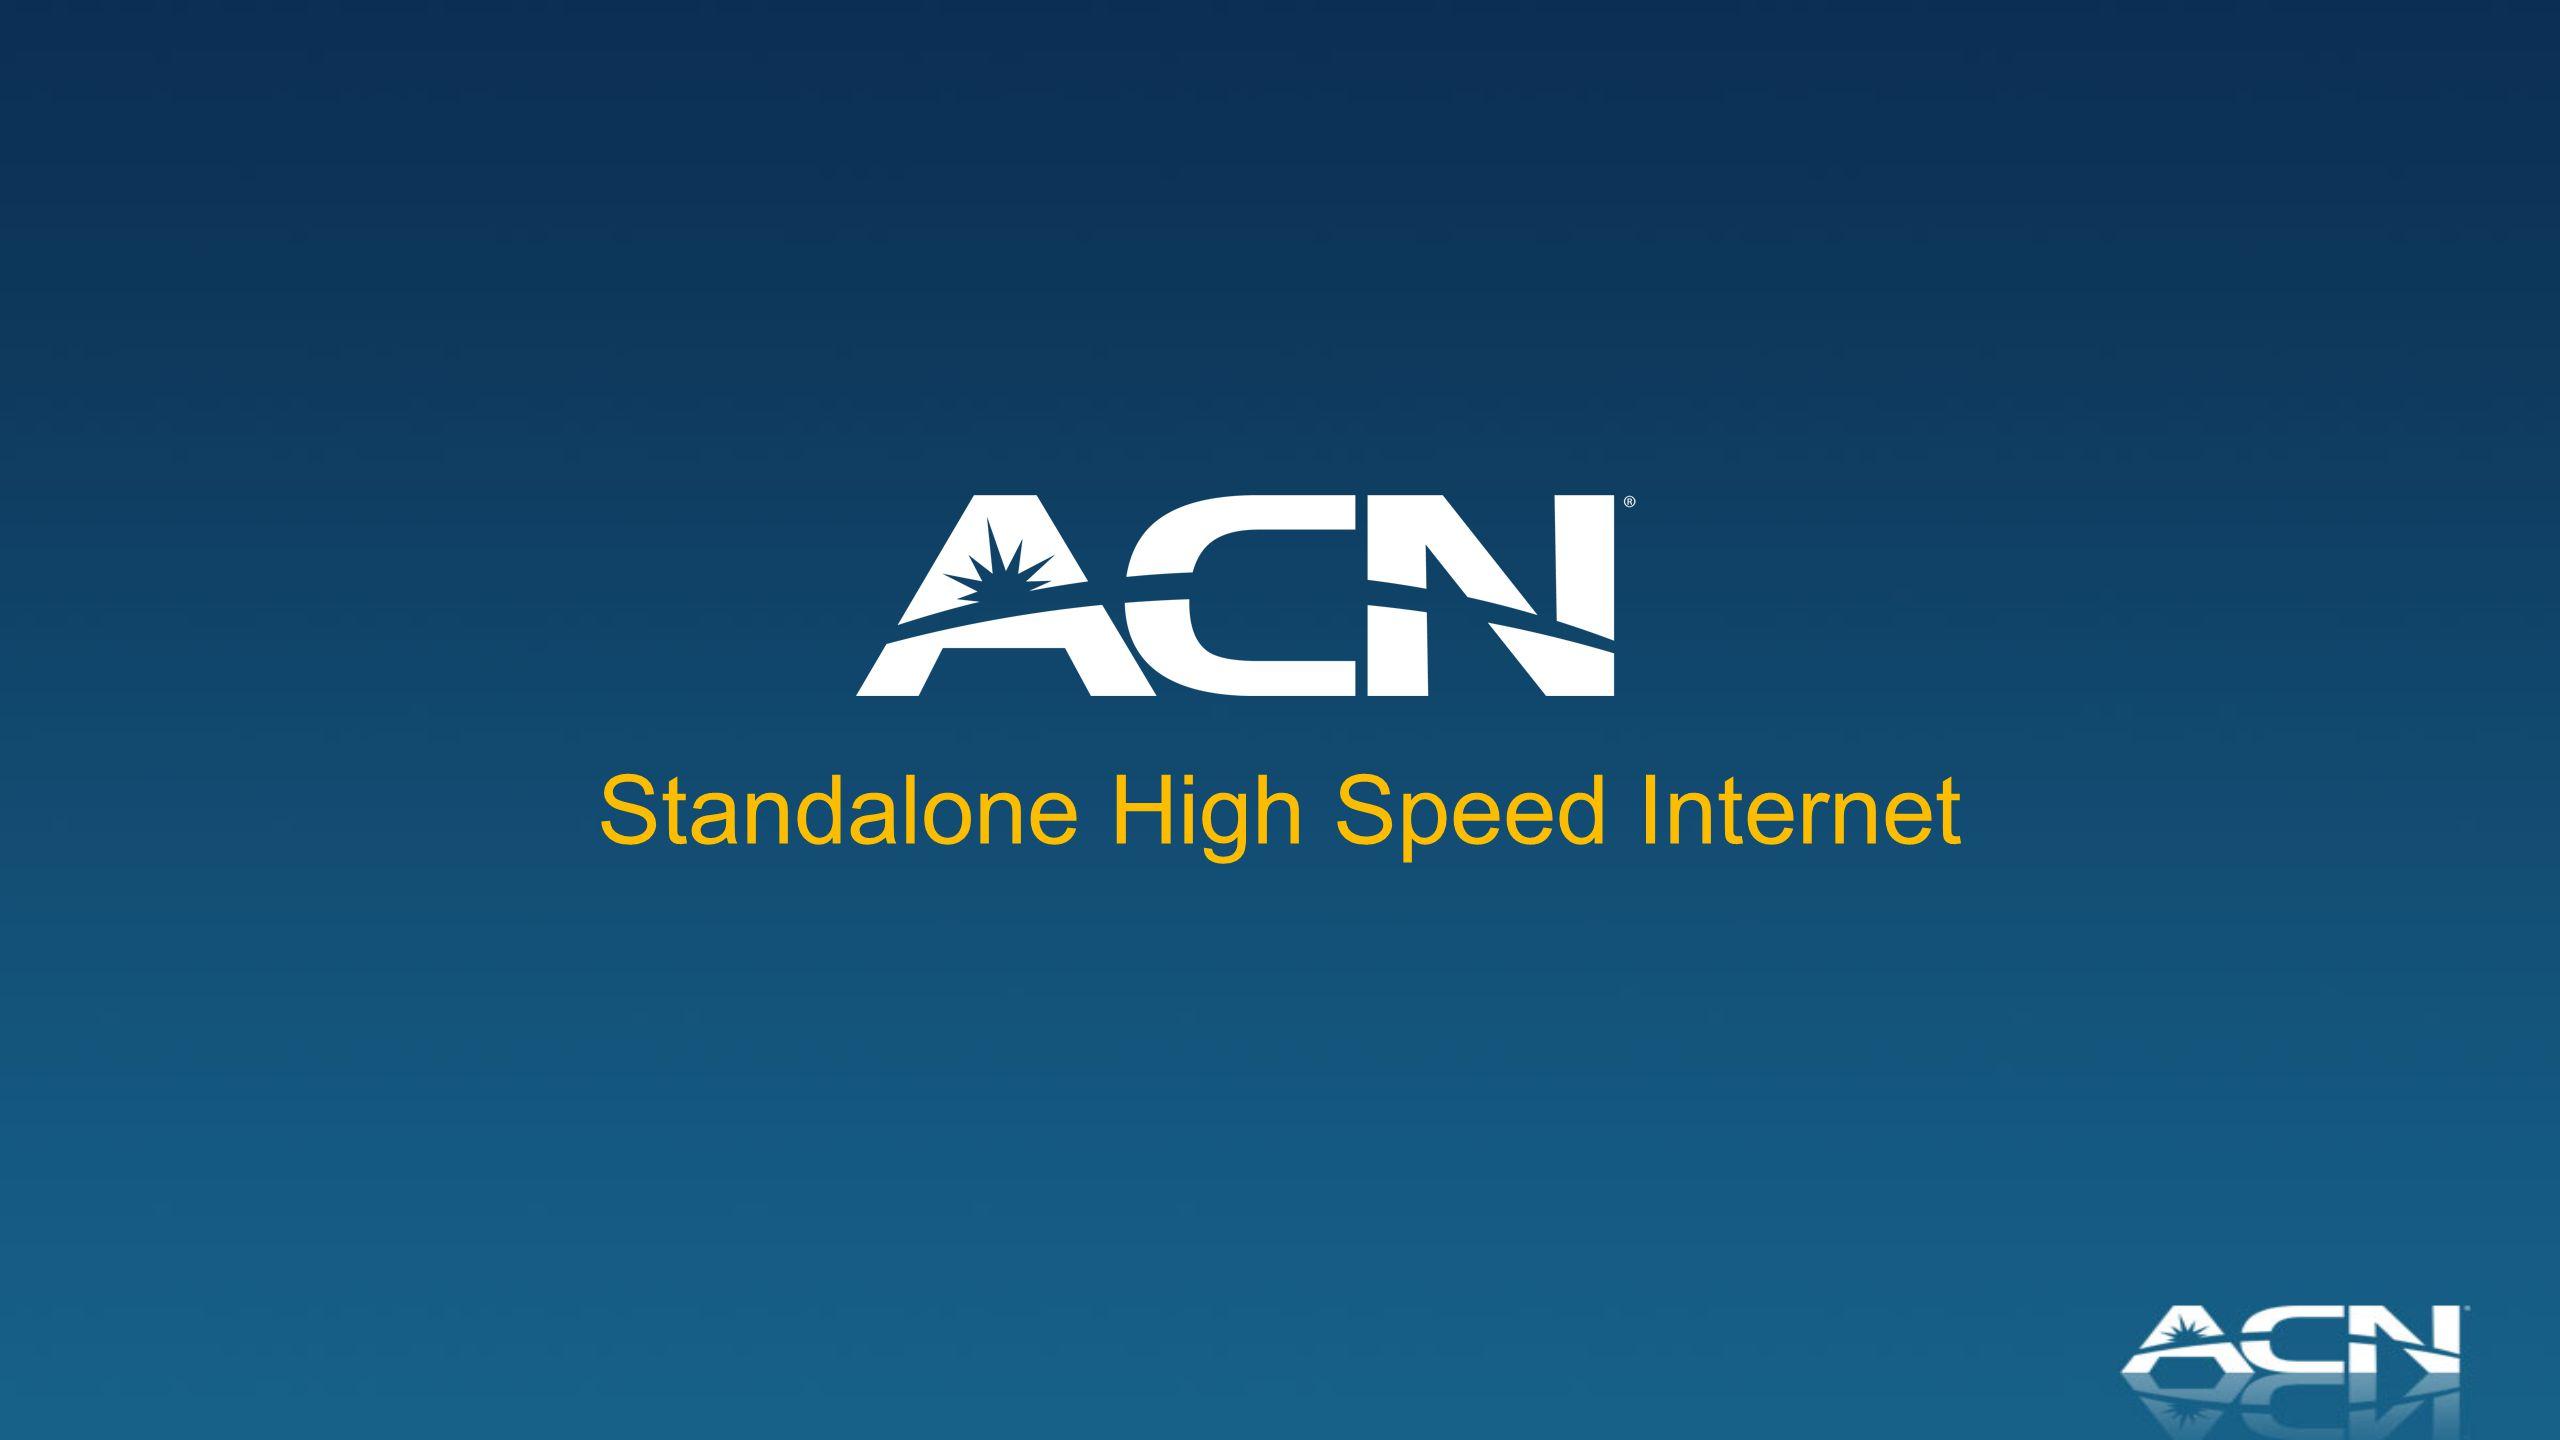 Standalone High Speed Internet